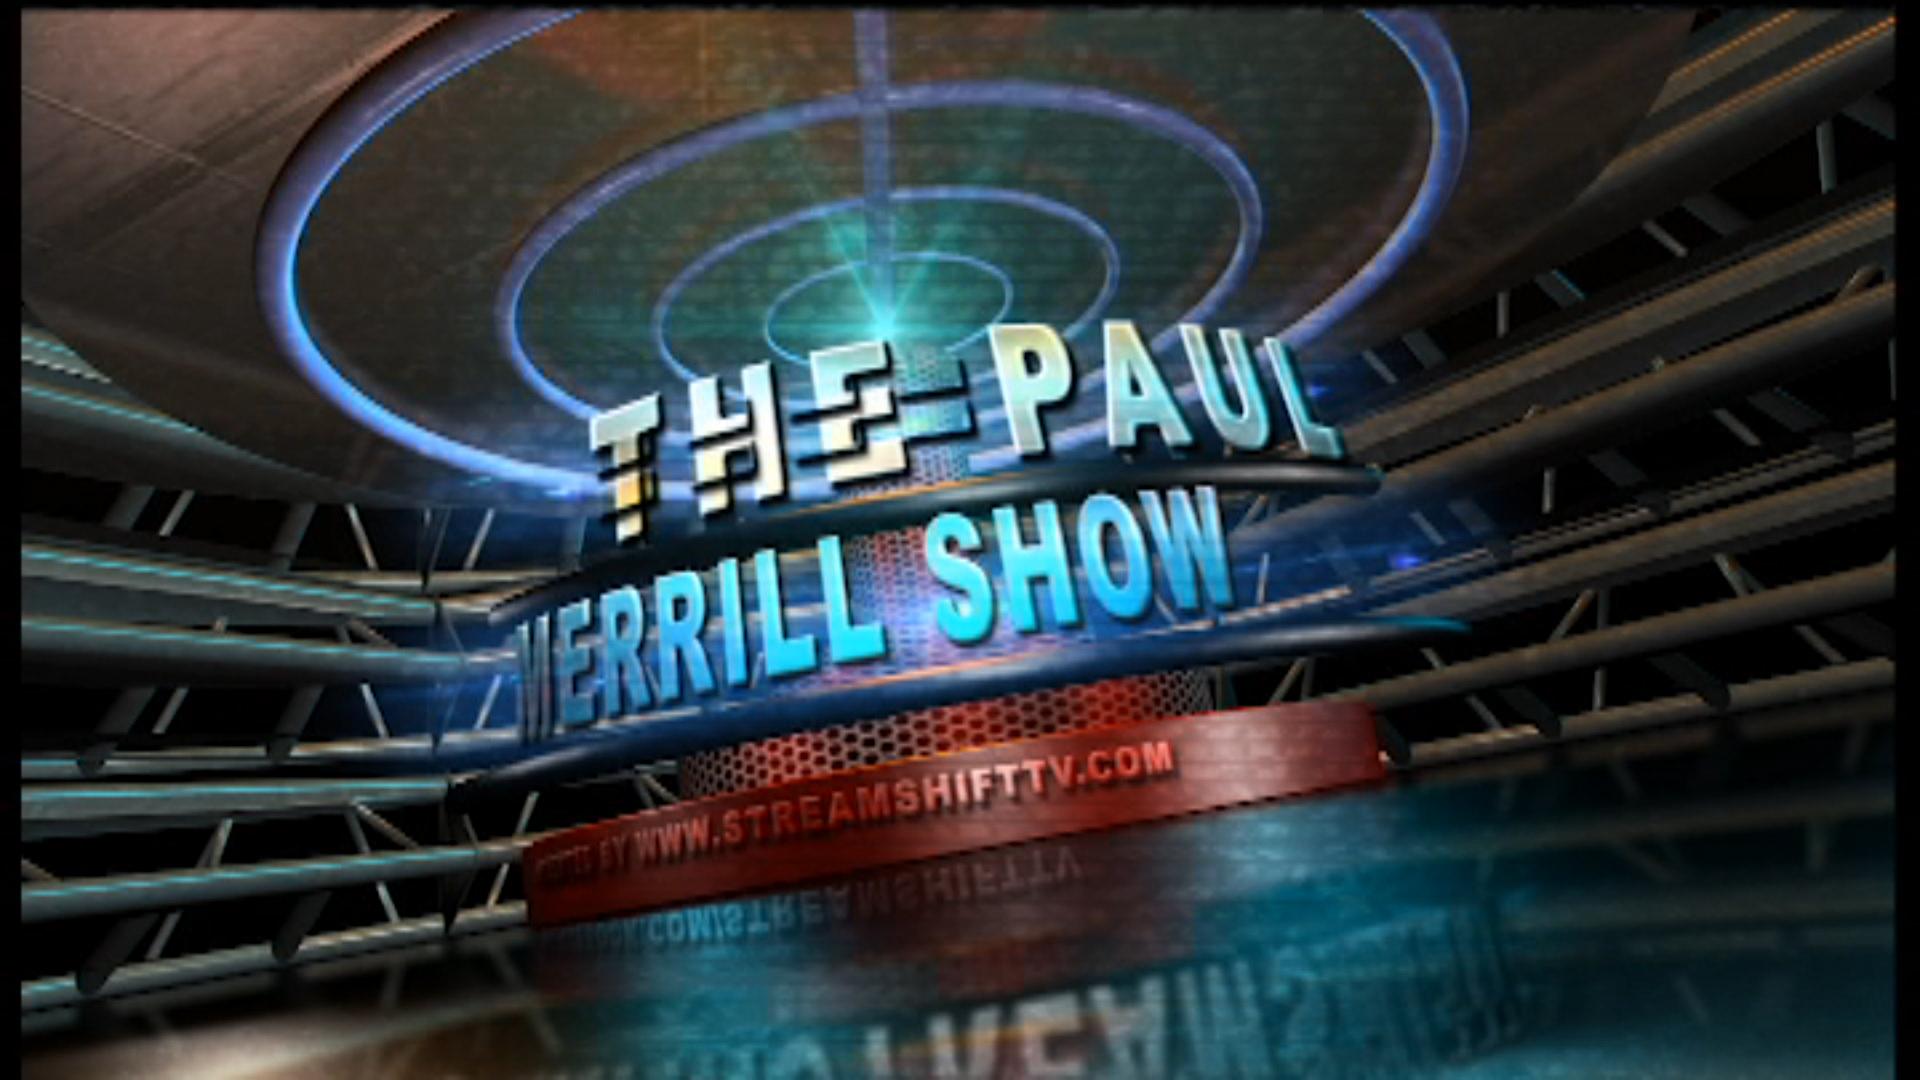 The Paul Merrill Show - May 13th, 2019